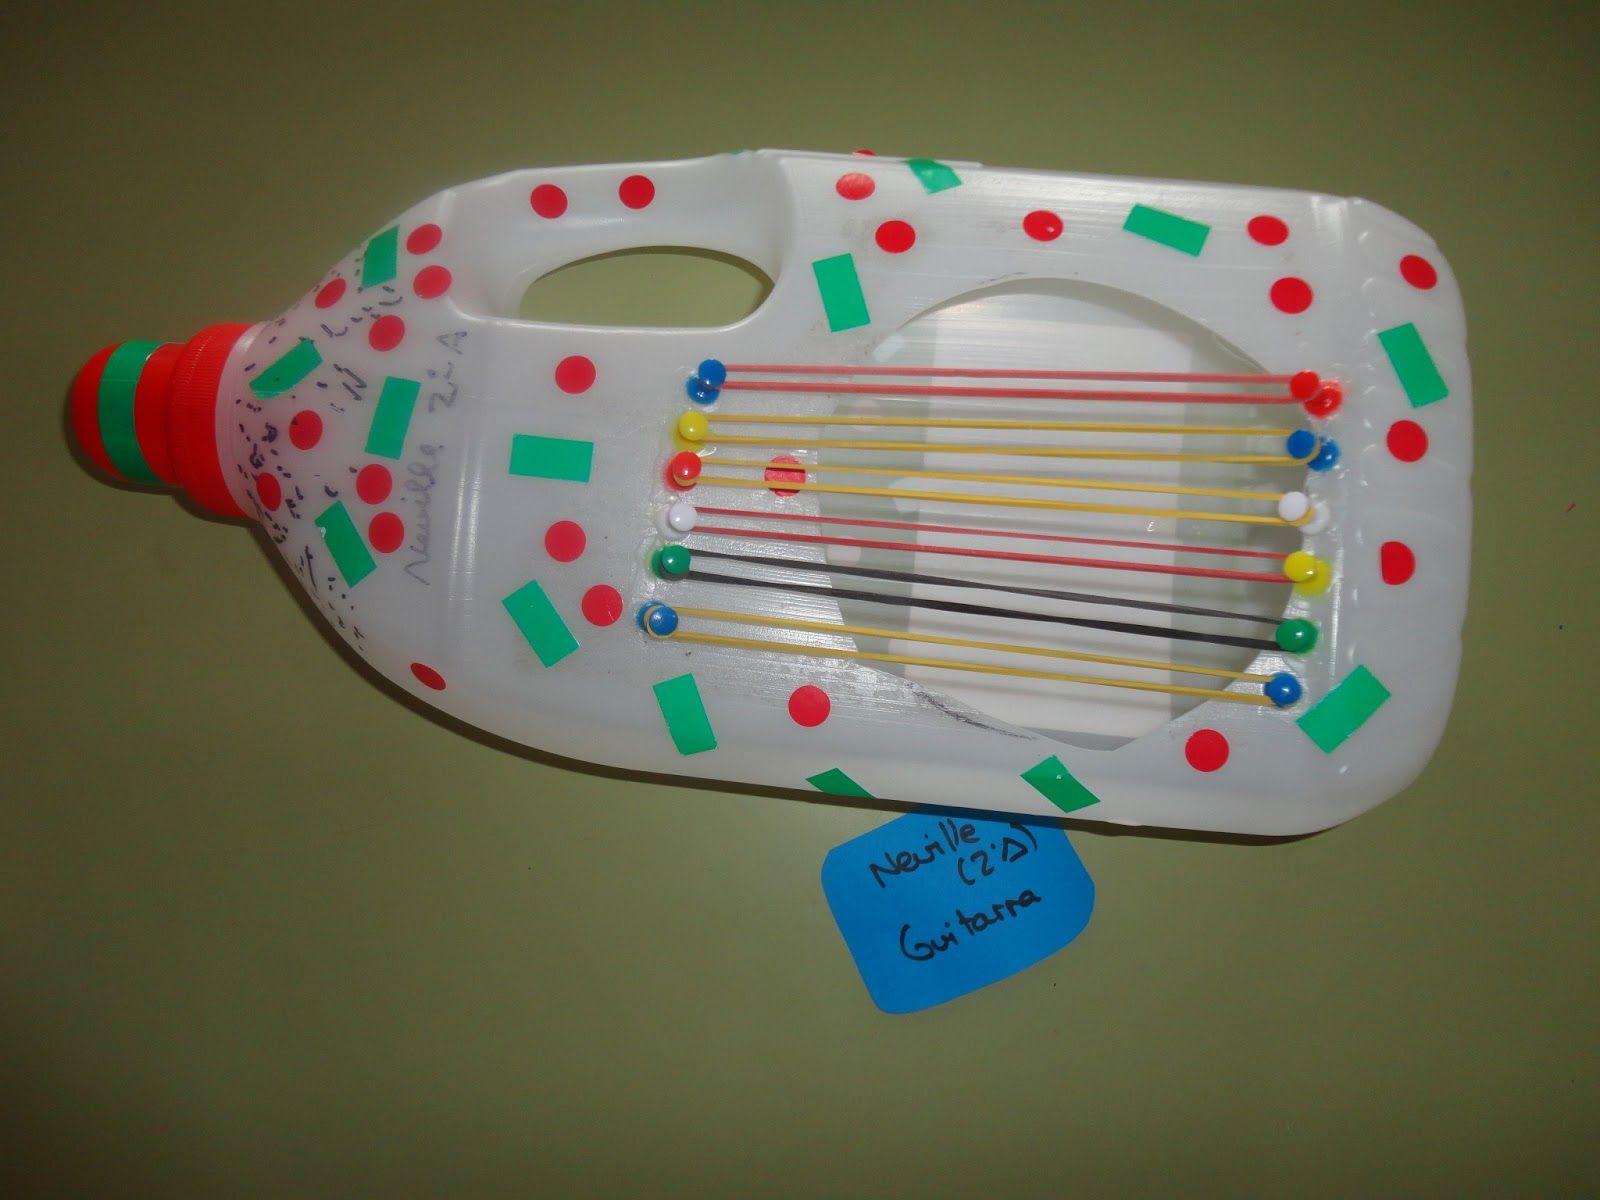 xilofono de material reciclado - Buscar con Google | Instruments faits  maison, Instruments de musique maison, Bricolage instrument de musique